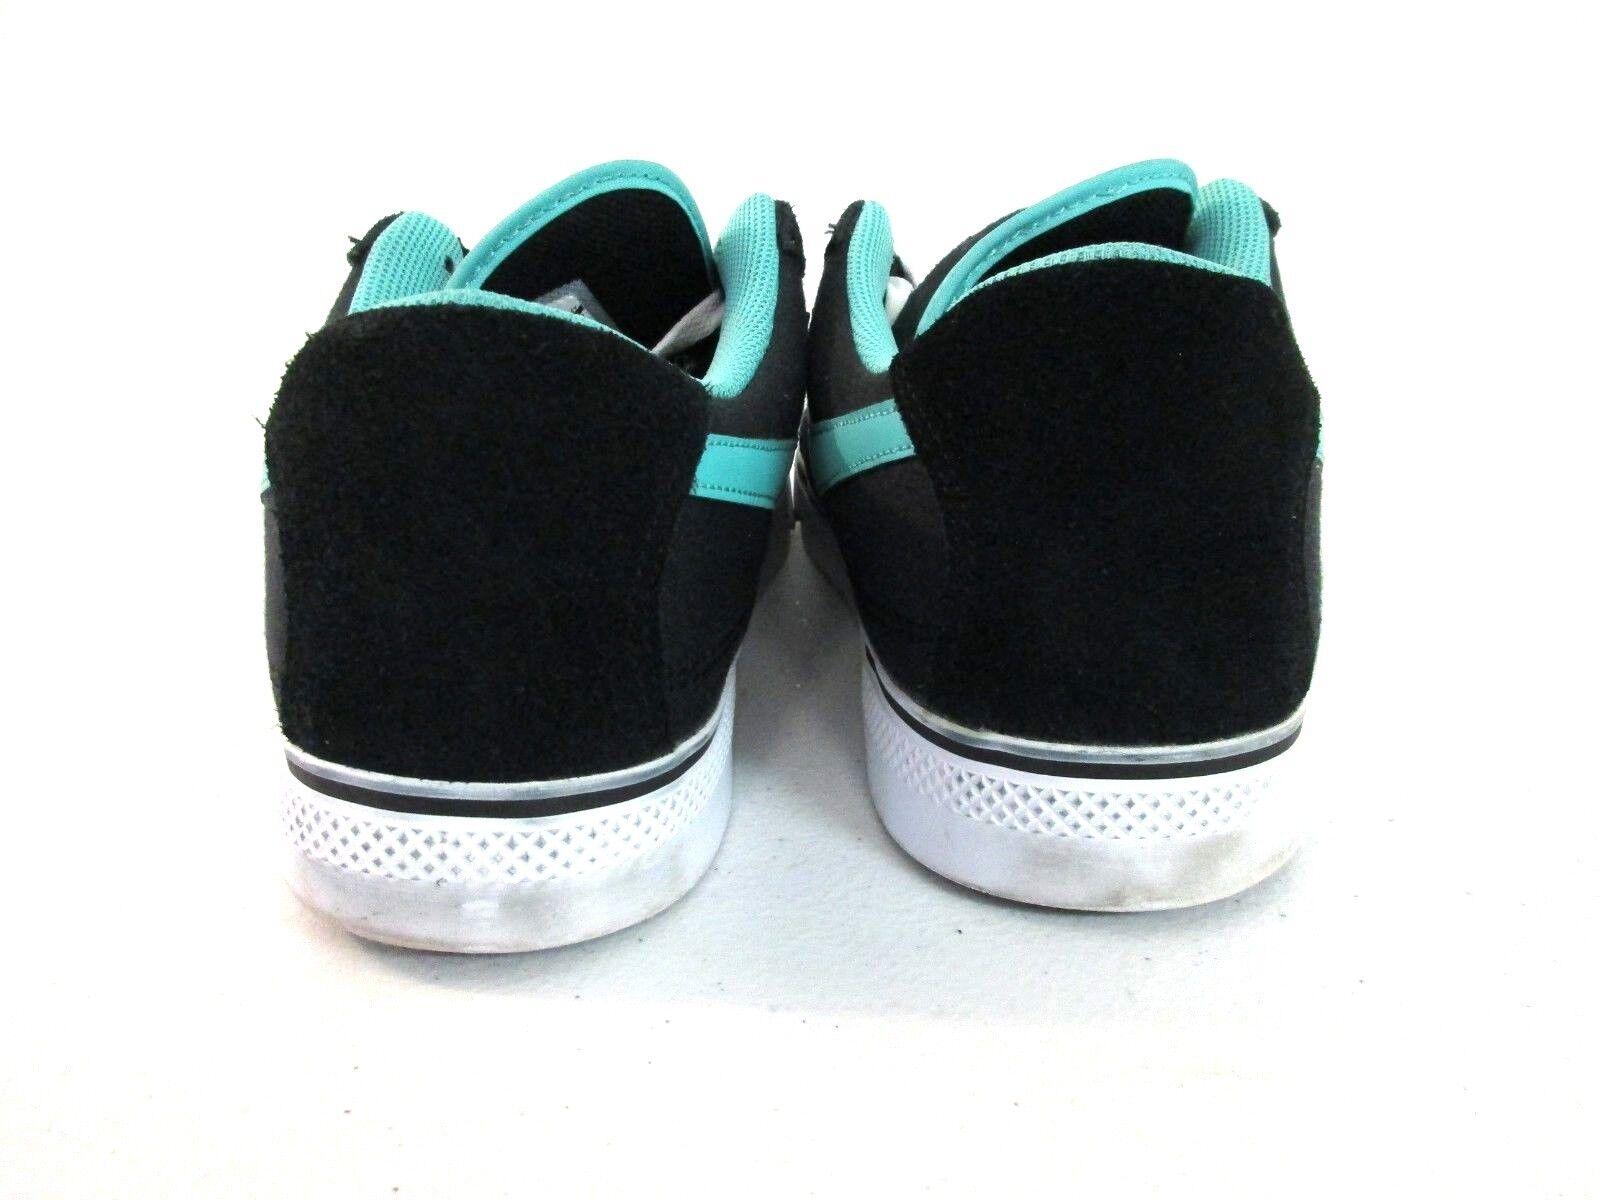 nike mavrk basso 2 black mint colore nero scarpe scarpe scarpe da skateboard sz 11 2435] | Usato in durabilità  | Sig/Sig Ra Scarpa  80a10c